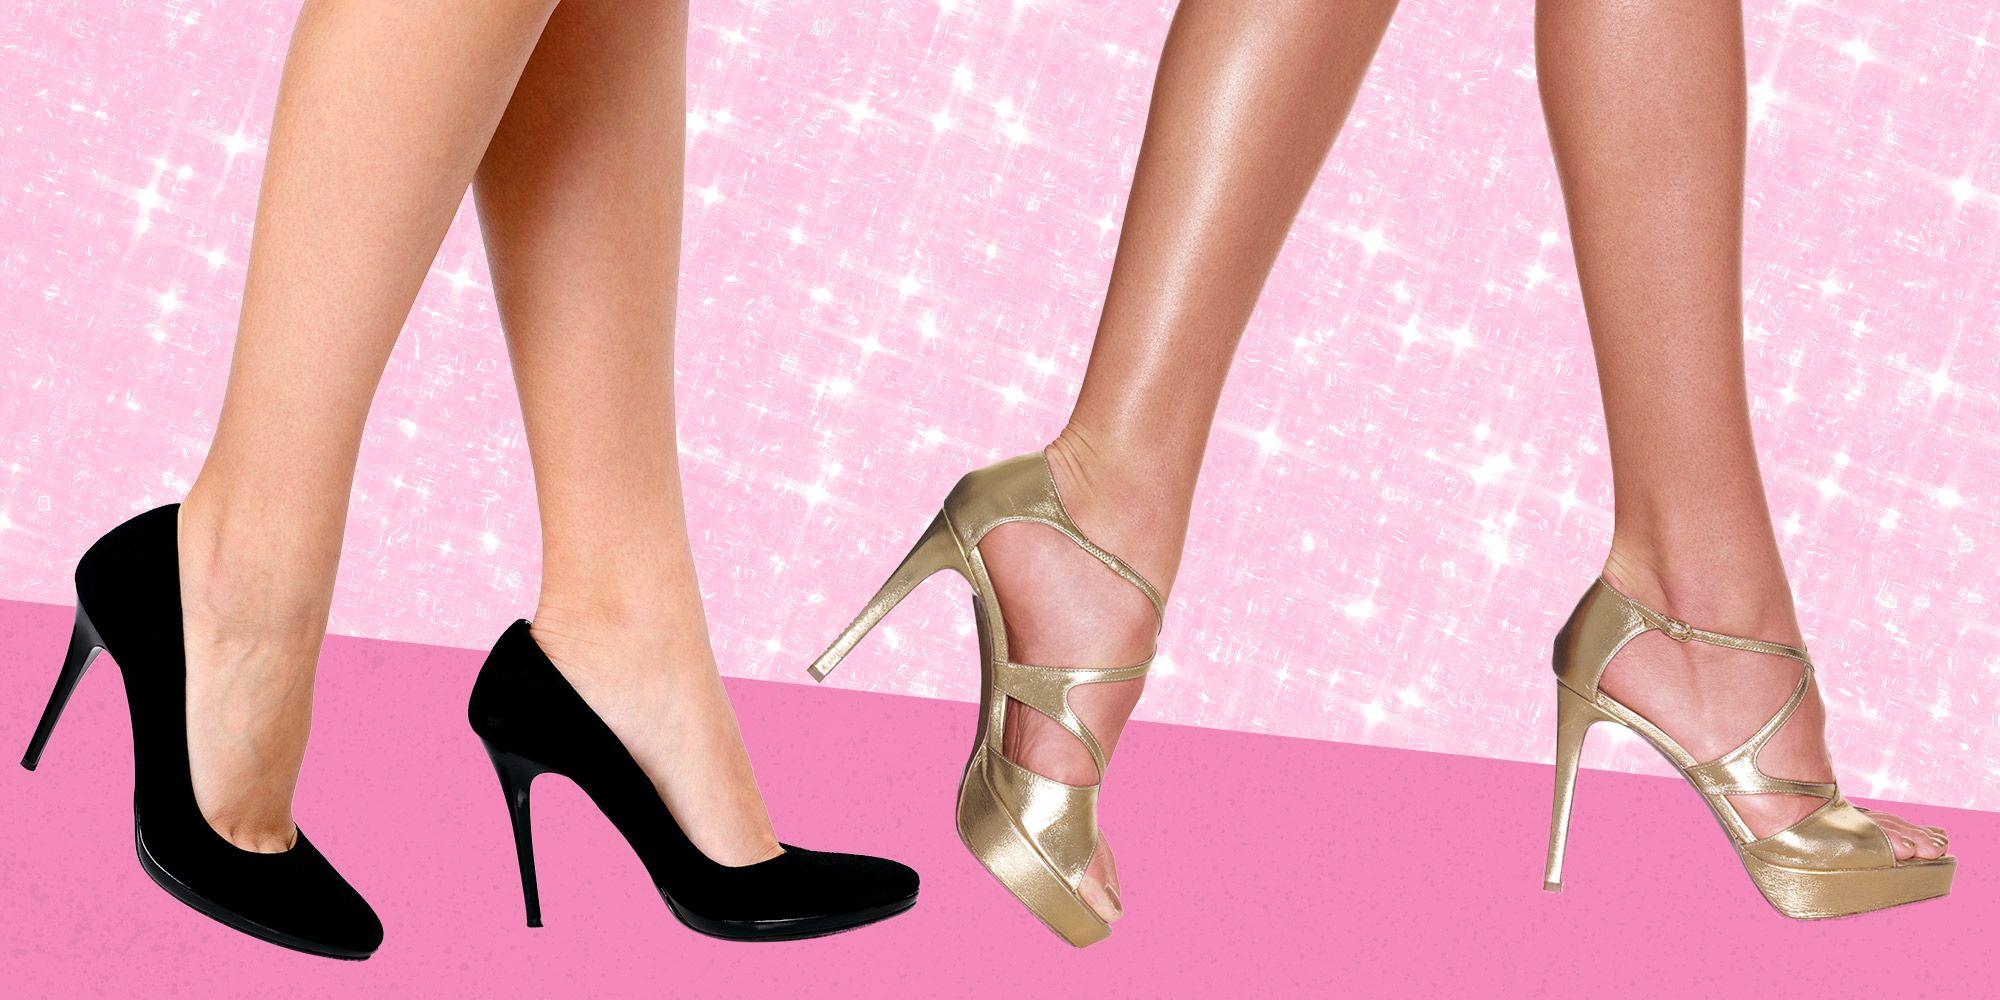 converse shoes hurt heel